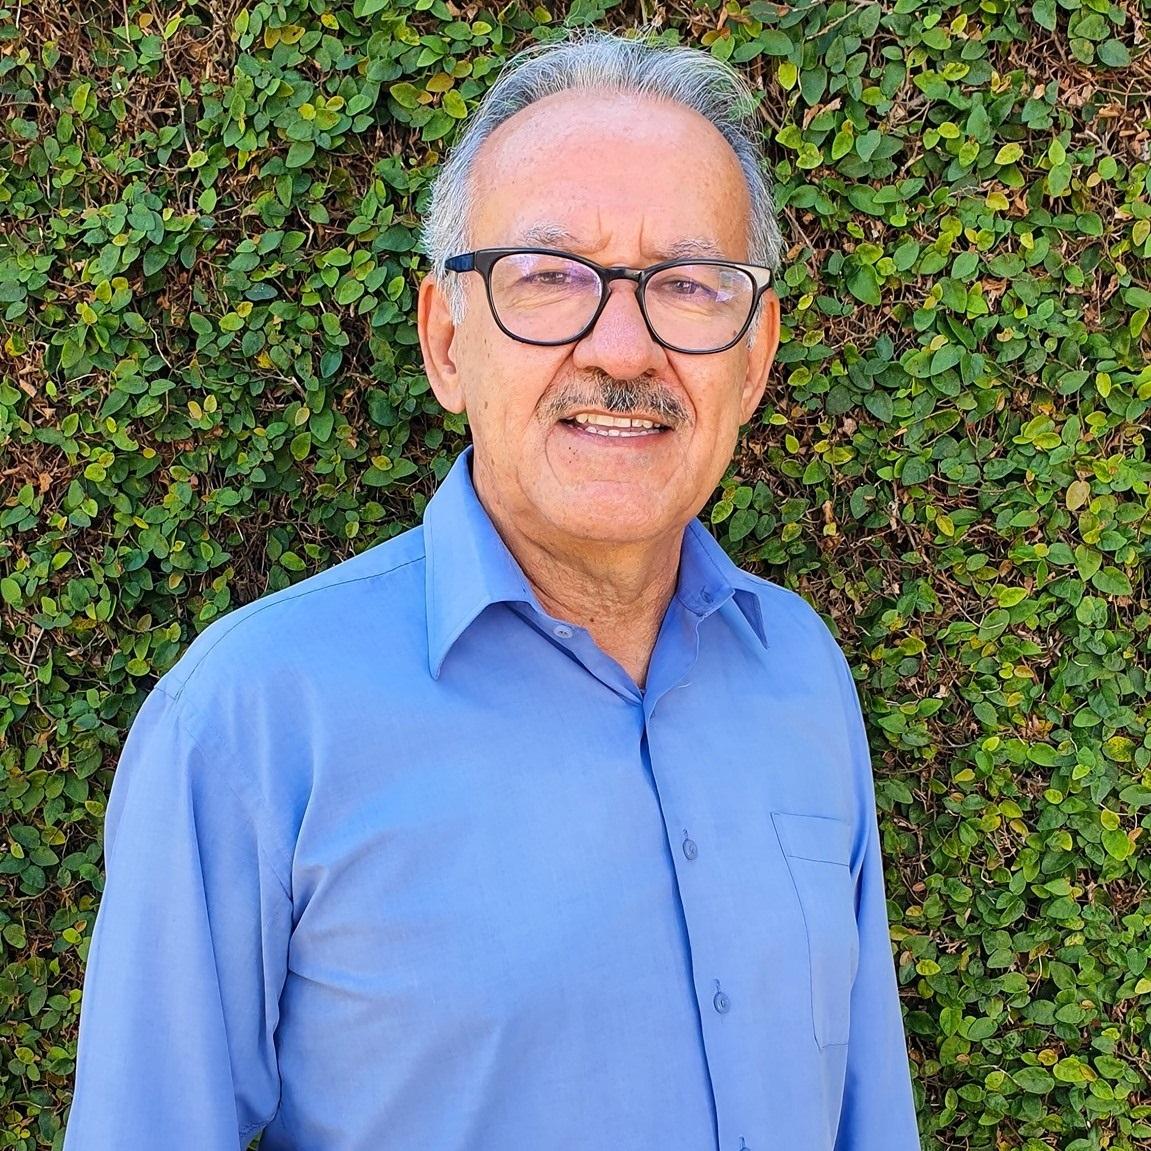 Sinval Silva